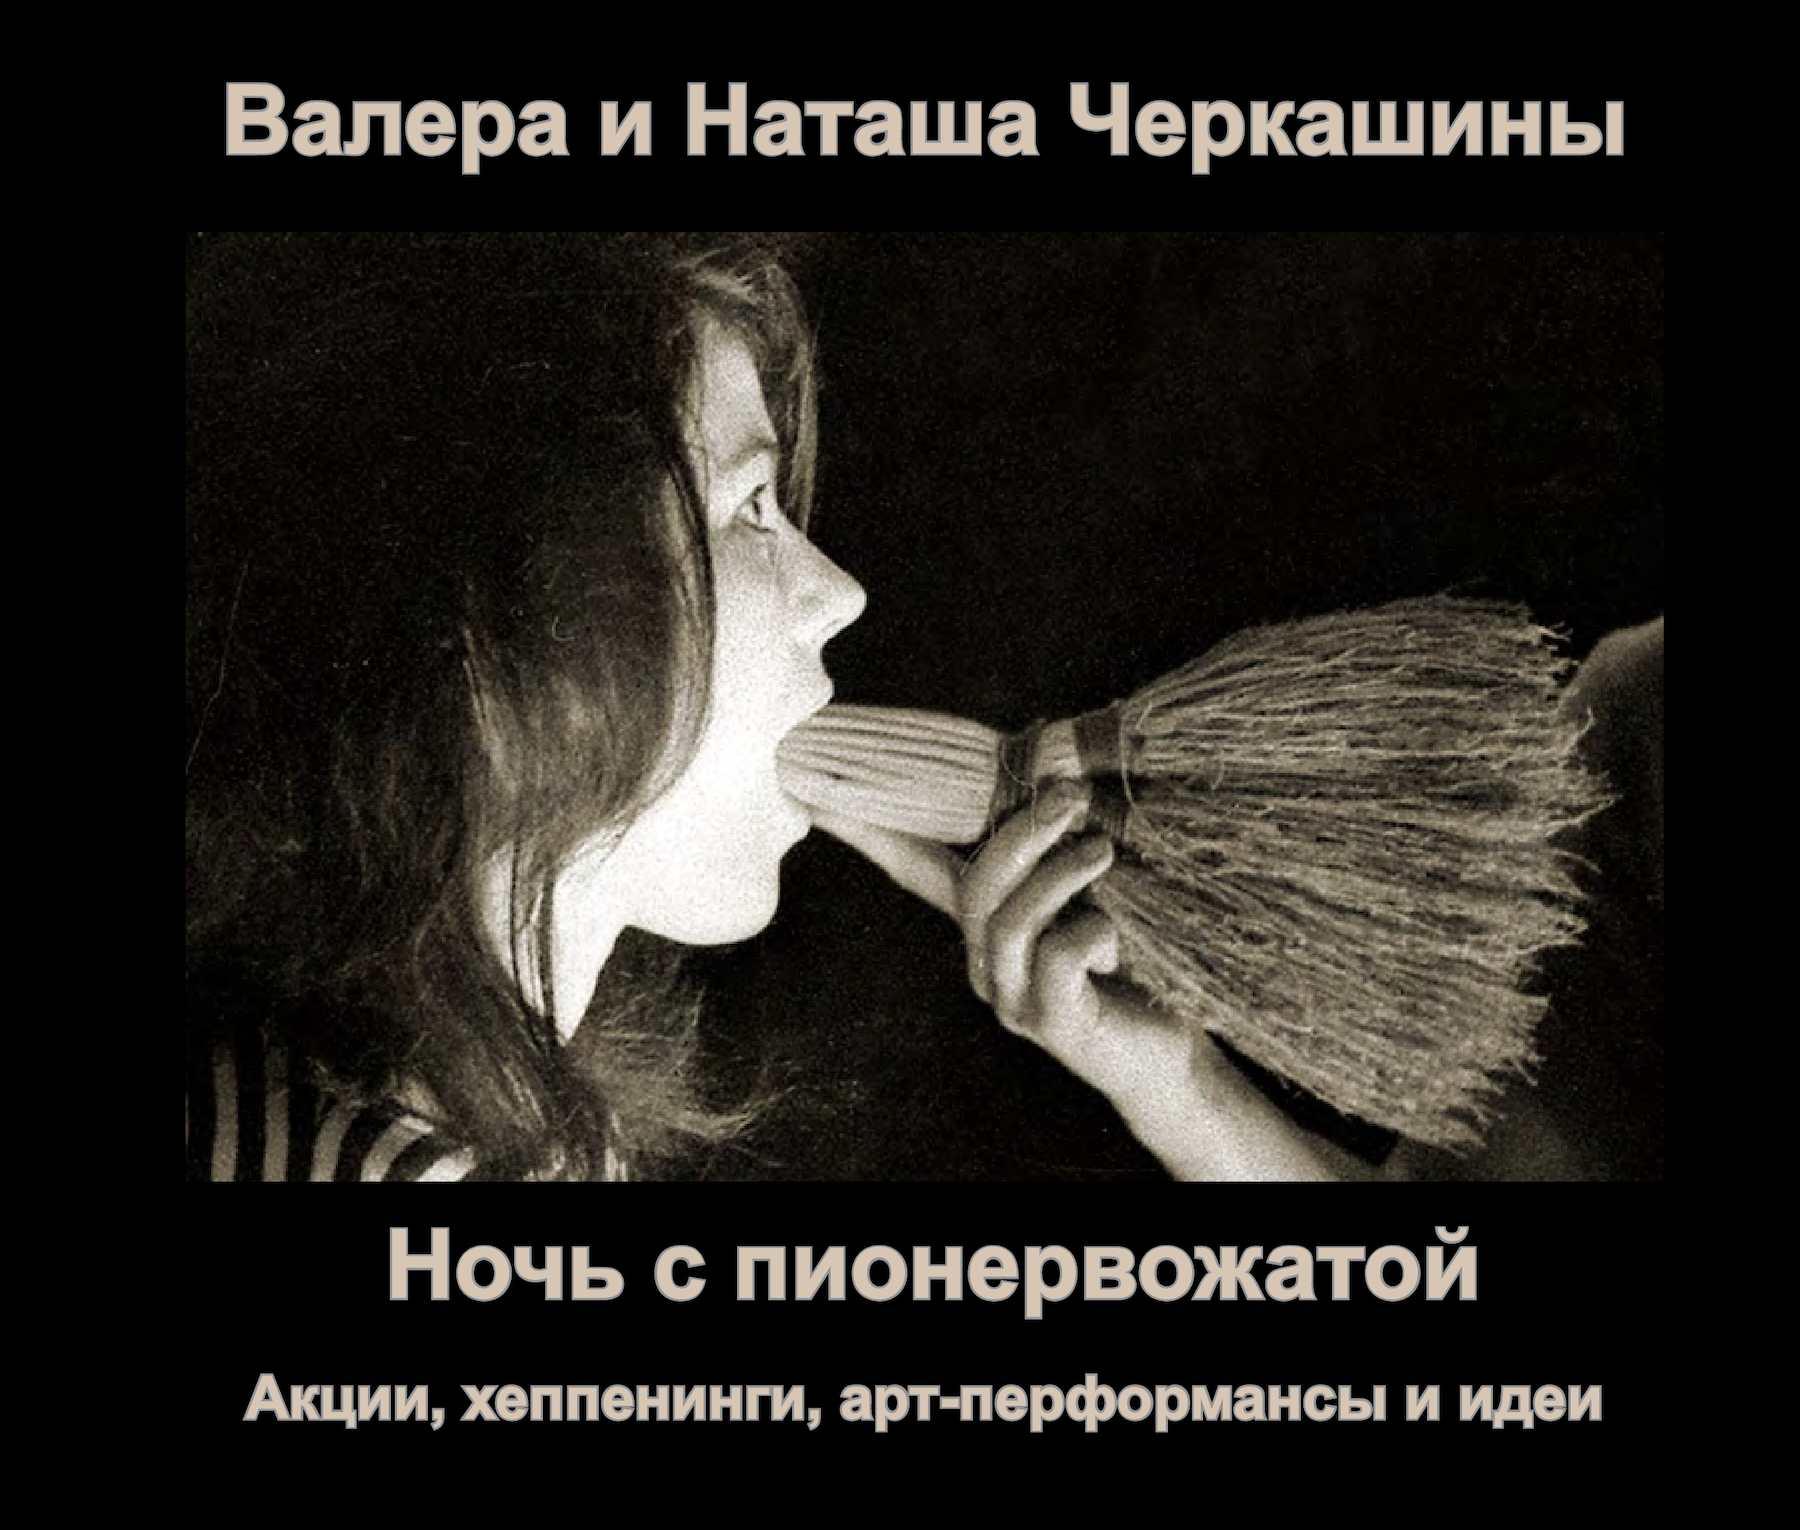 Ева фальк поцелуйчик фото 55-981